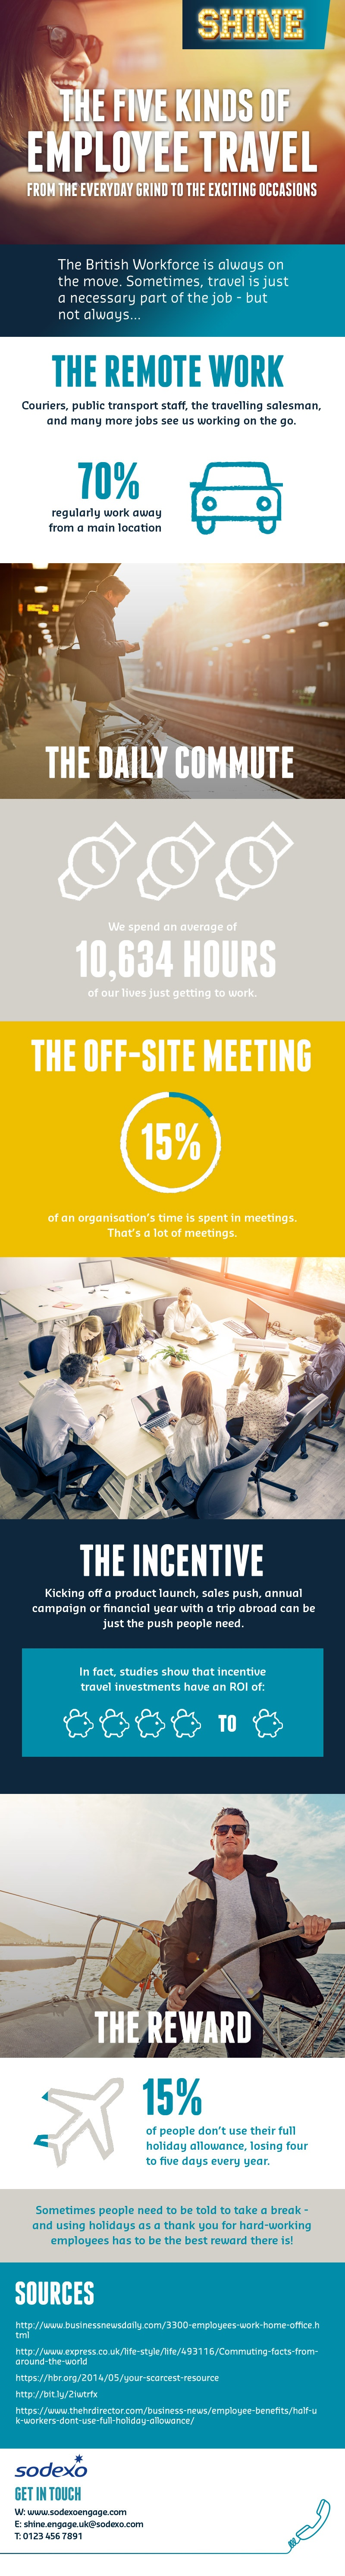 SHINE-Employee-Travel.jpg